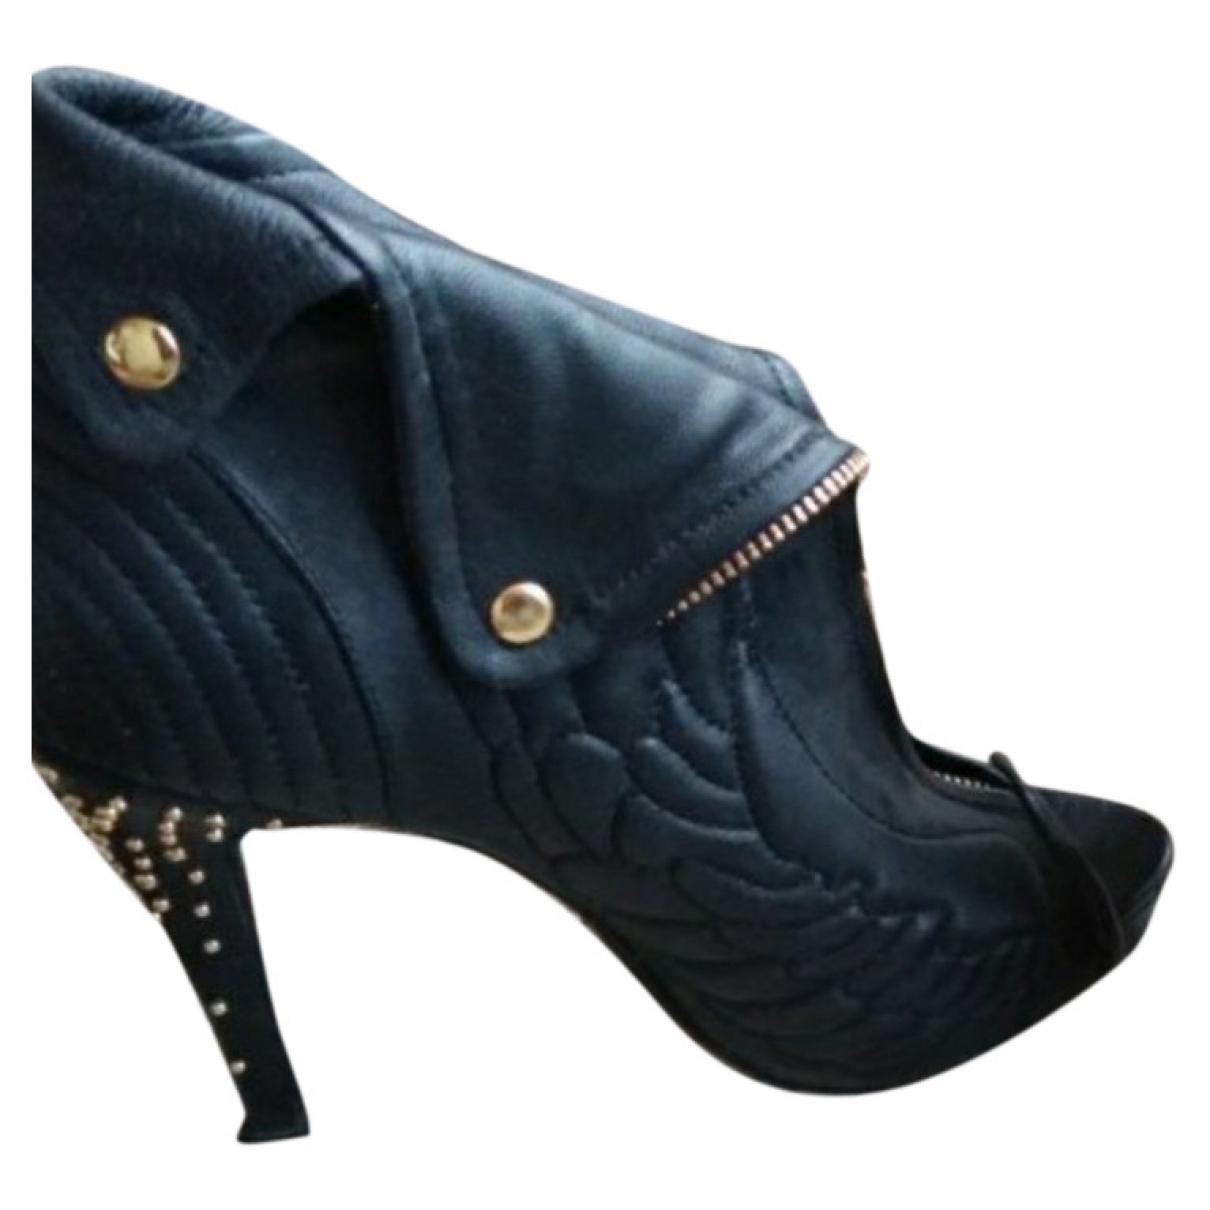 Alexander Mcqueen - Boots   pour femme en cuir - noir